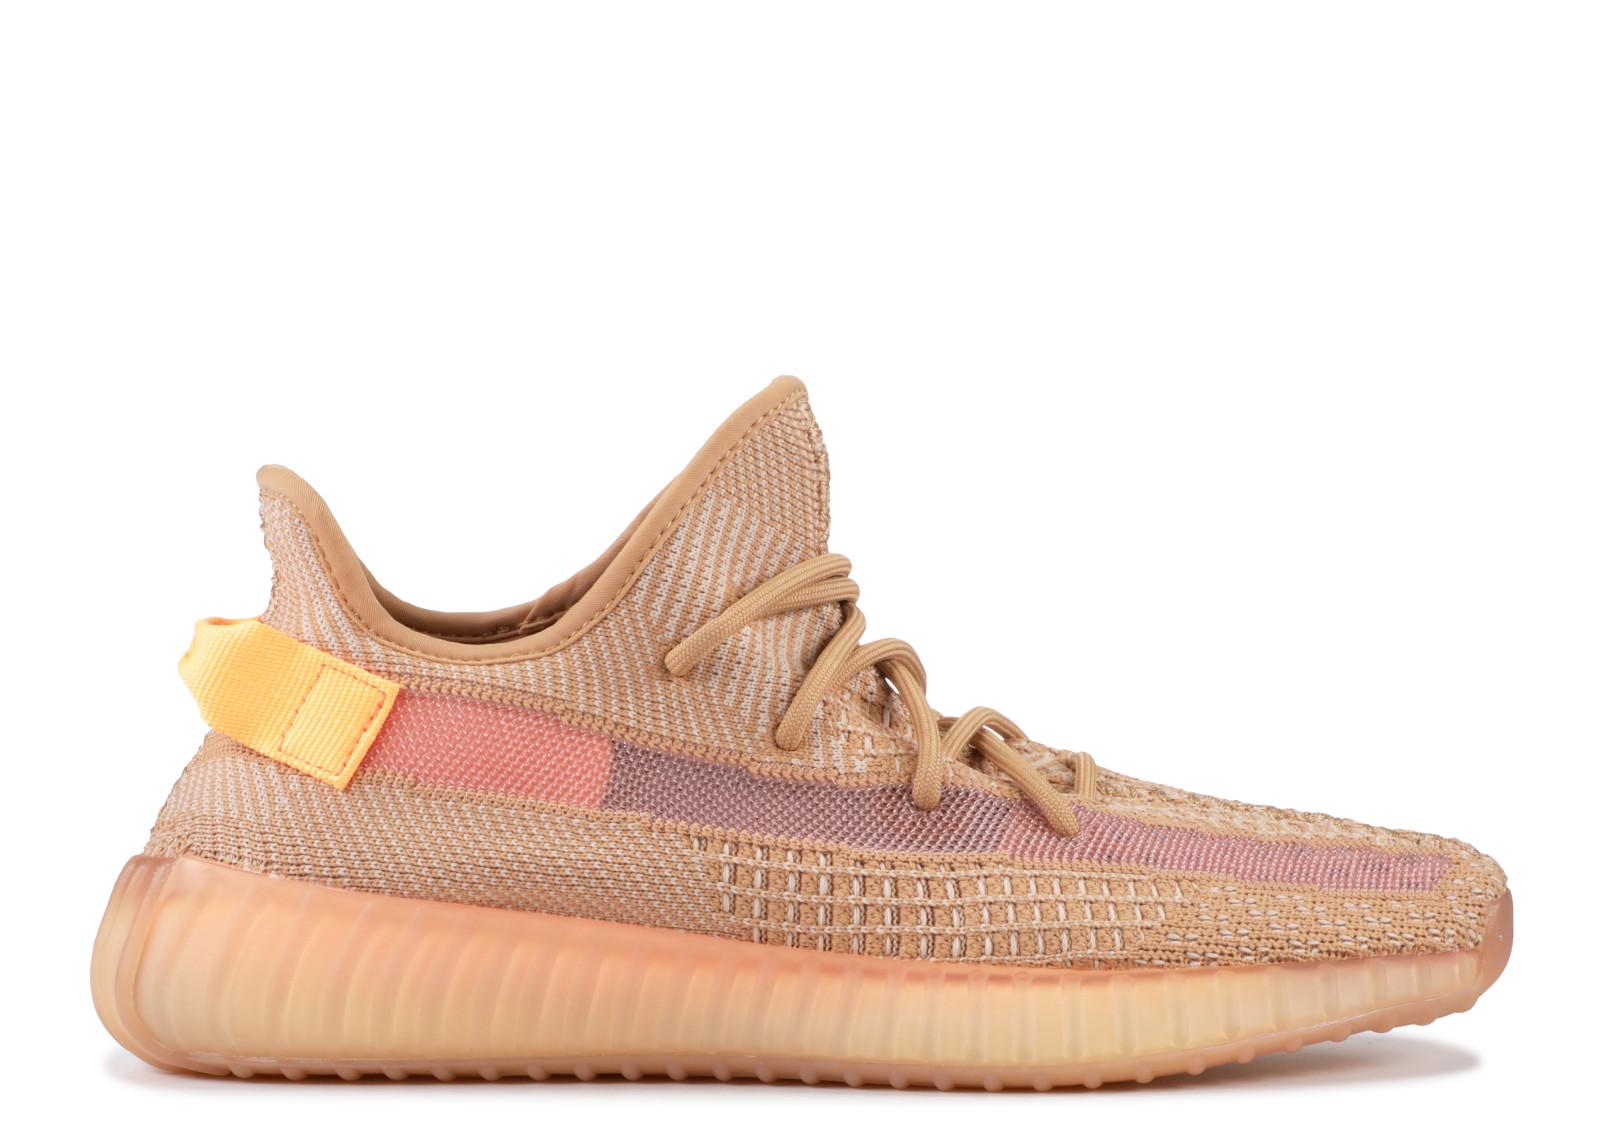 adidas yeezy boost 350 40